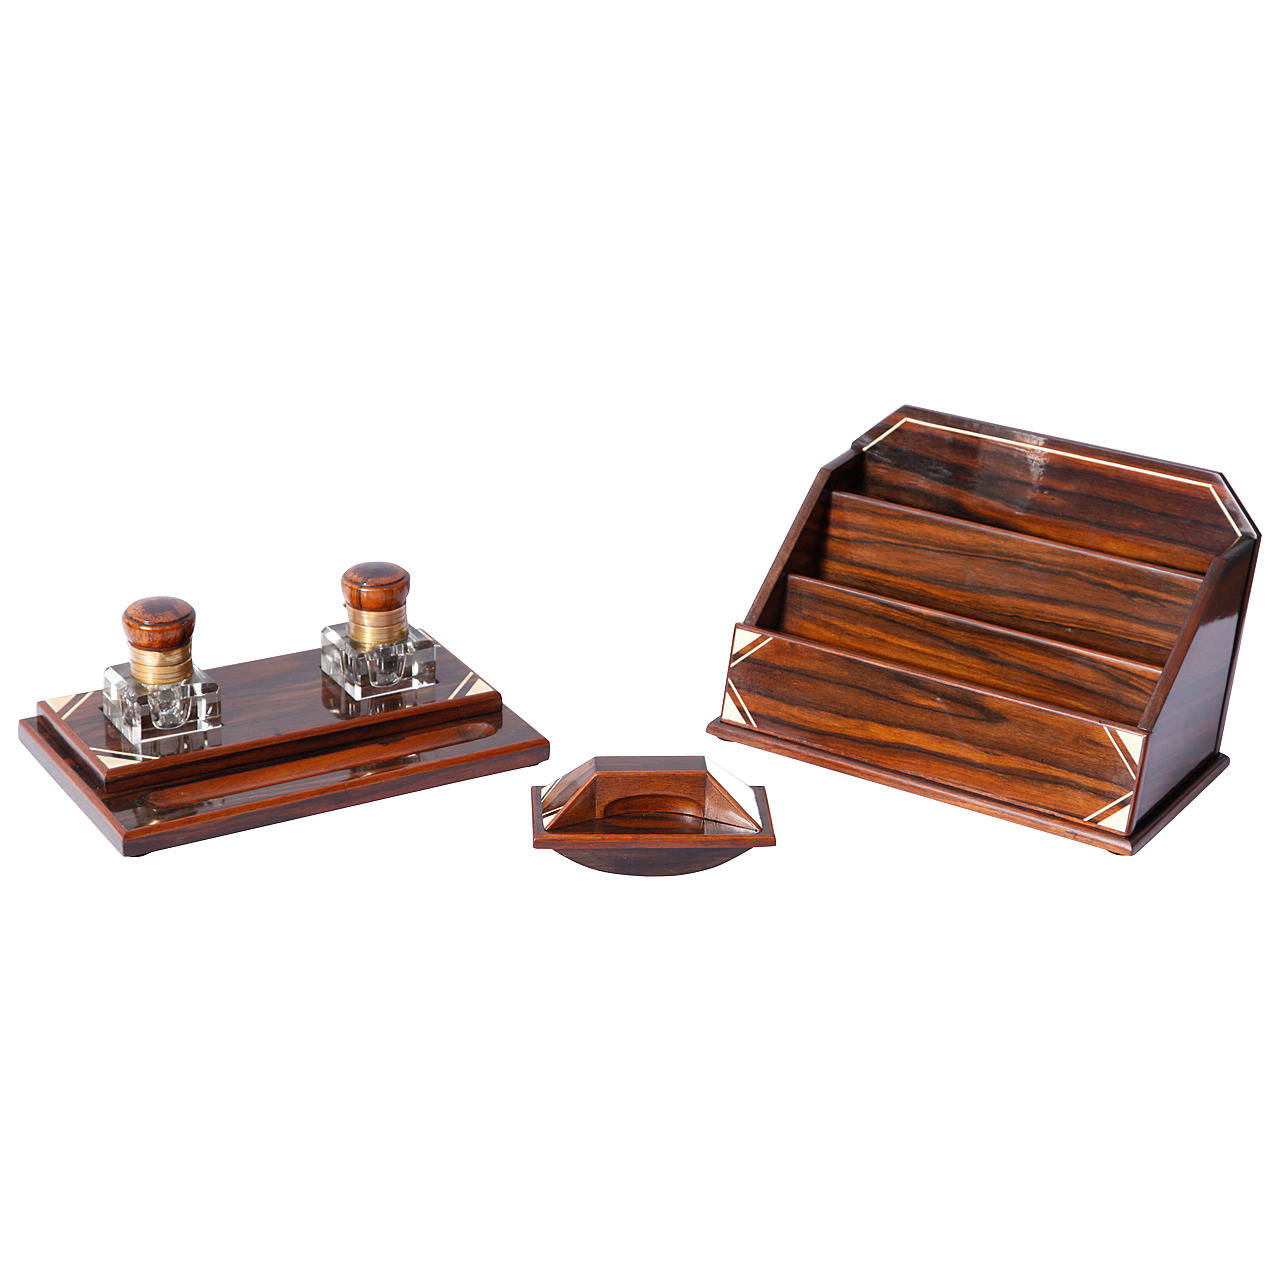 Ebony macassar Art-Deco desk set